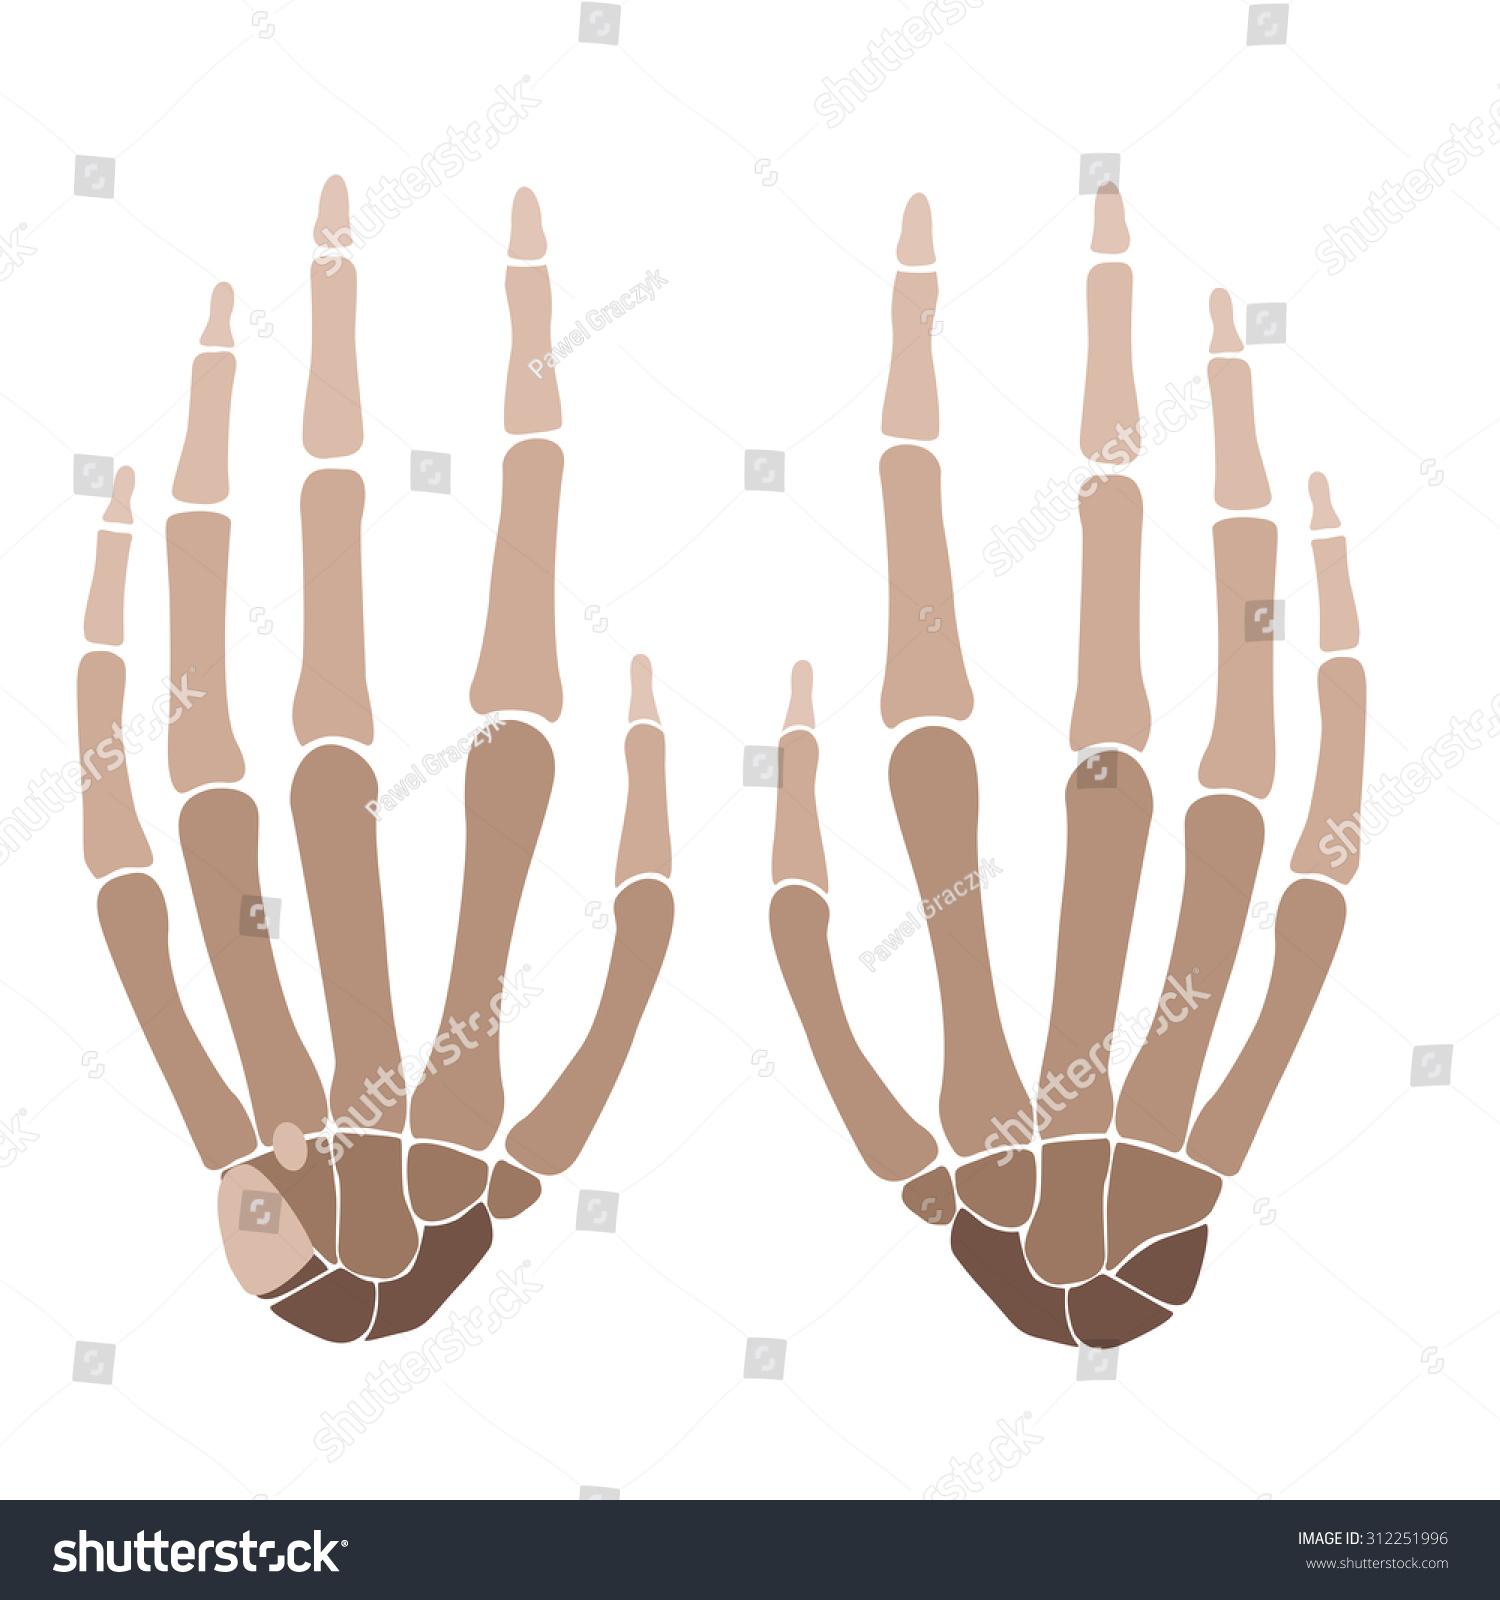 Vector Illustration Human Hand Bones Anatomy Stock Vector (Royalty ...